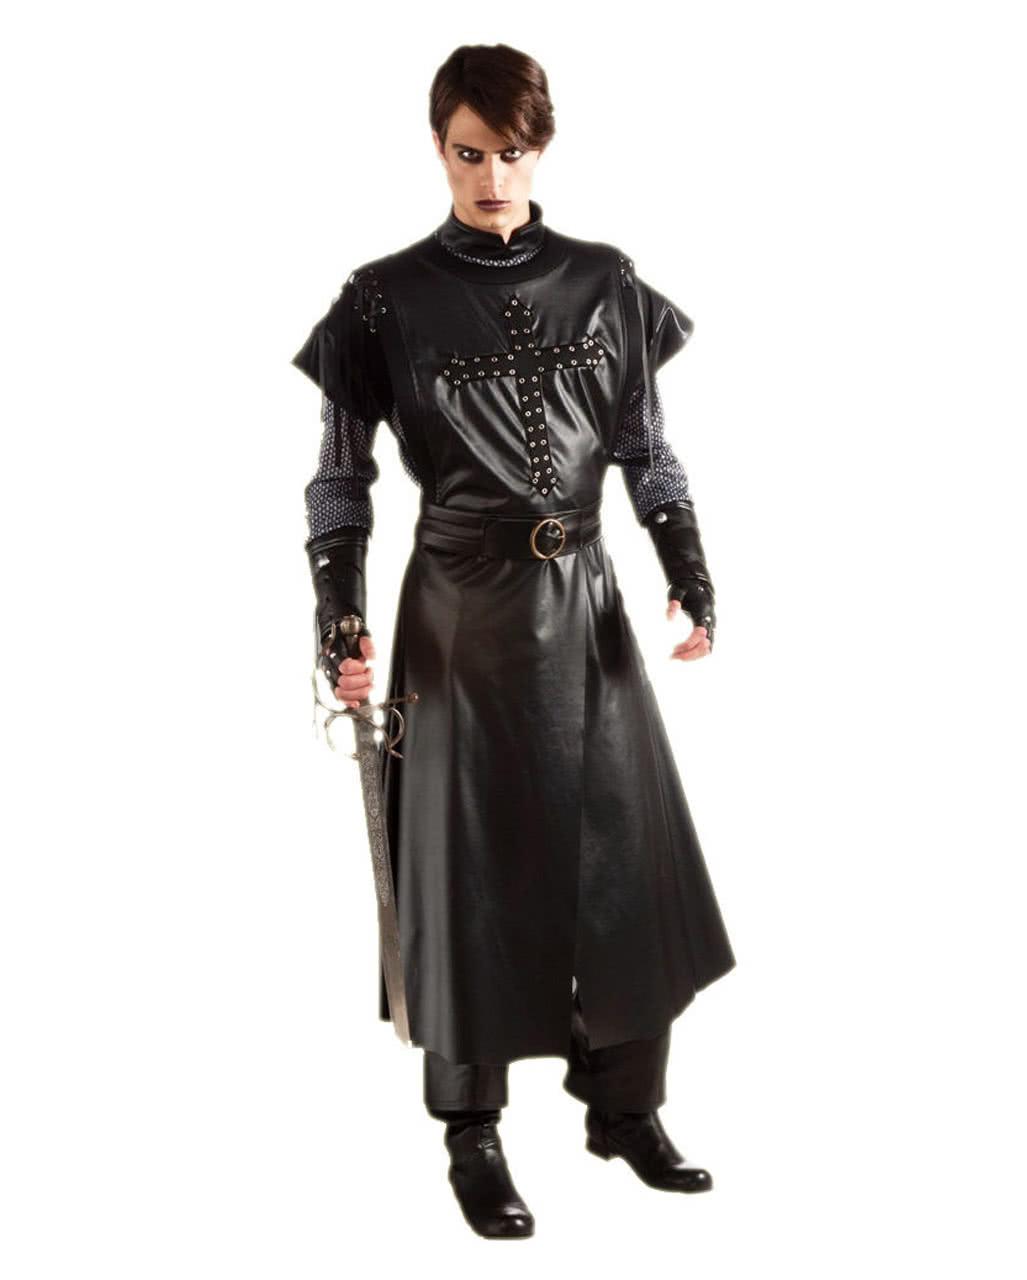 black crusader costume knight templar costume black knight outfit horror. Black Bedroom Furniture Sets. Home Design Ideas